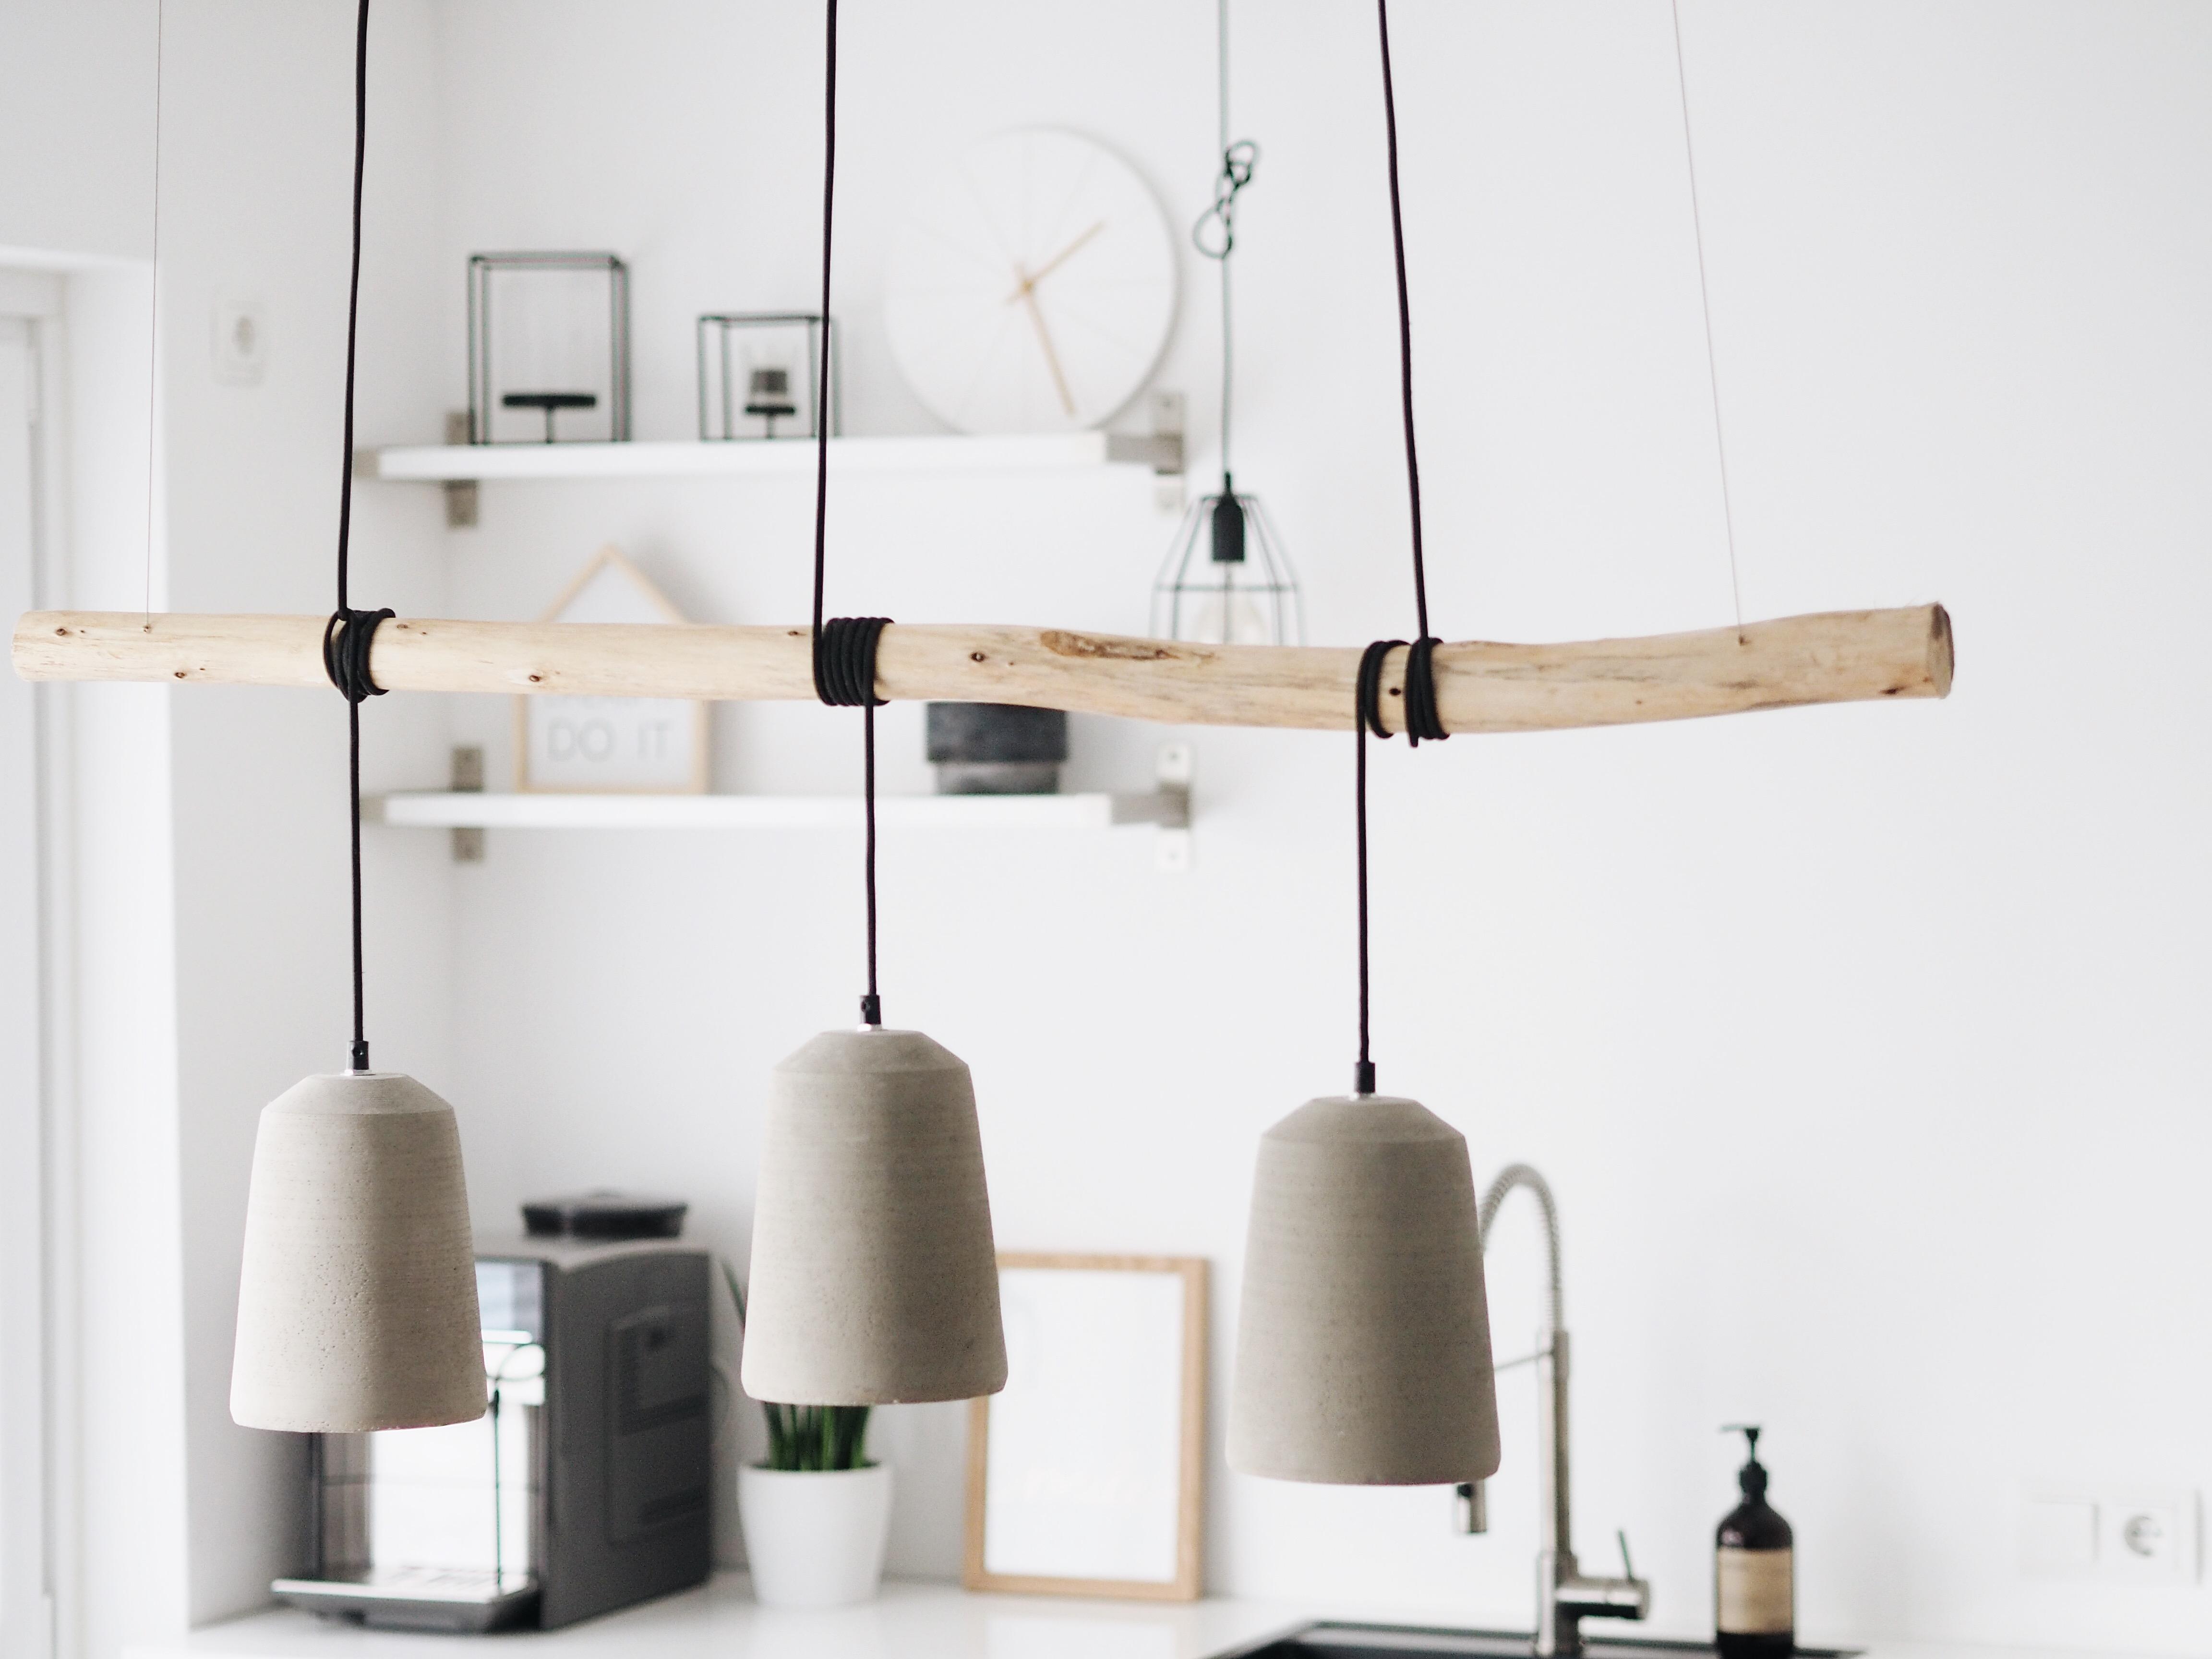 Ikea bejublad dunstabzugshaube test dunstabzugshaube hangend